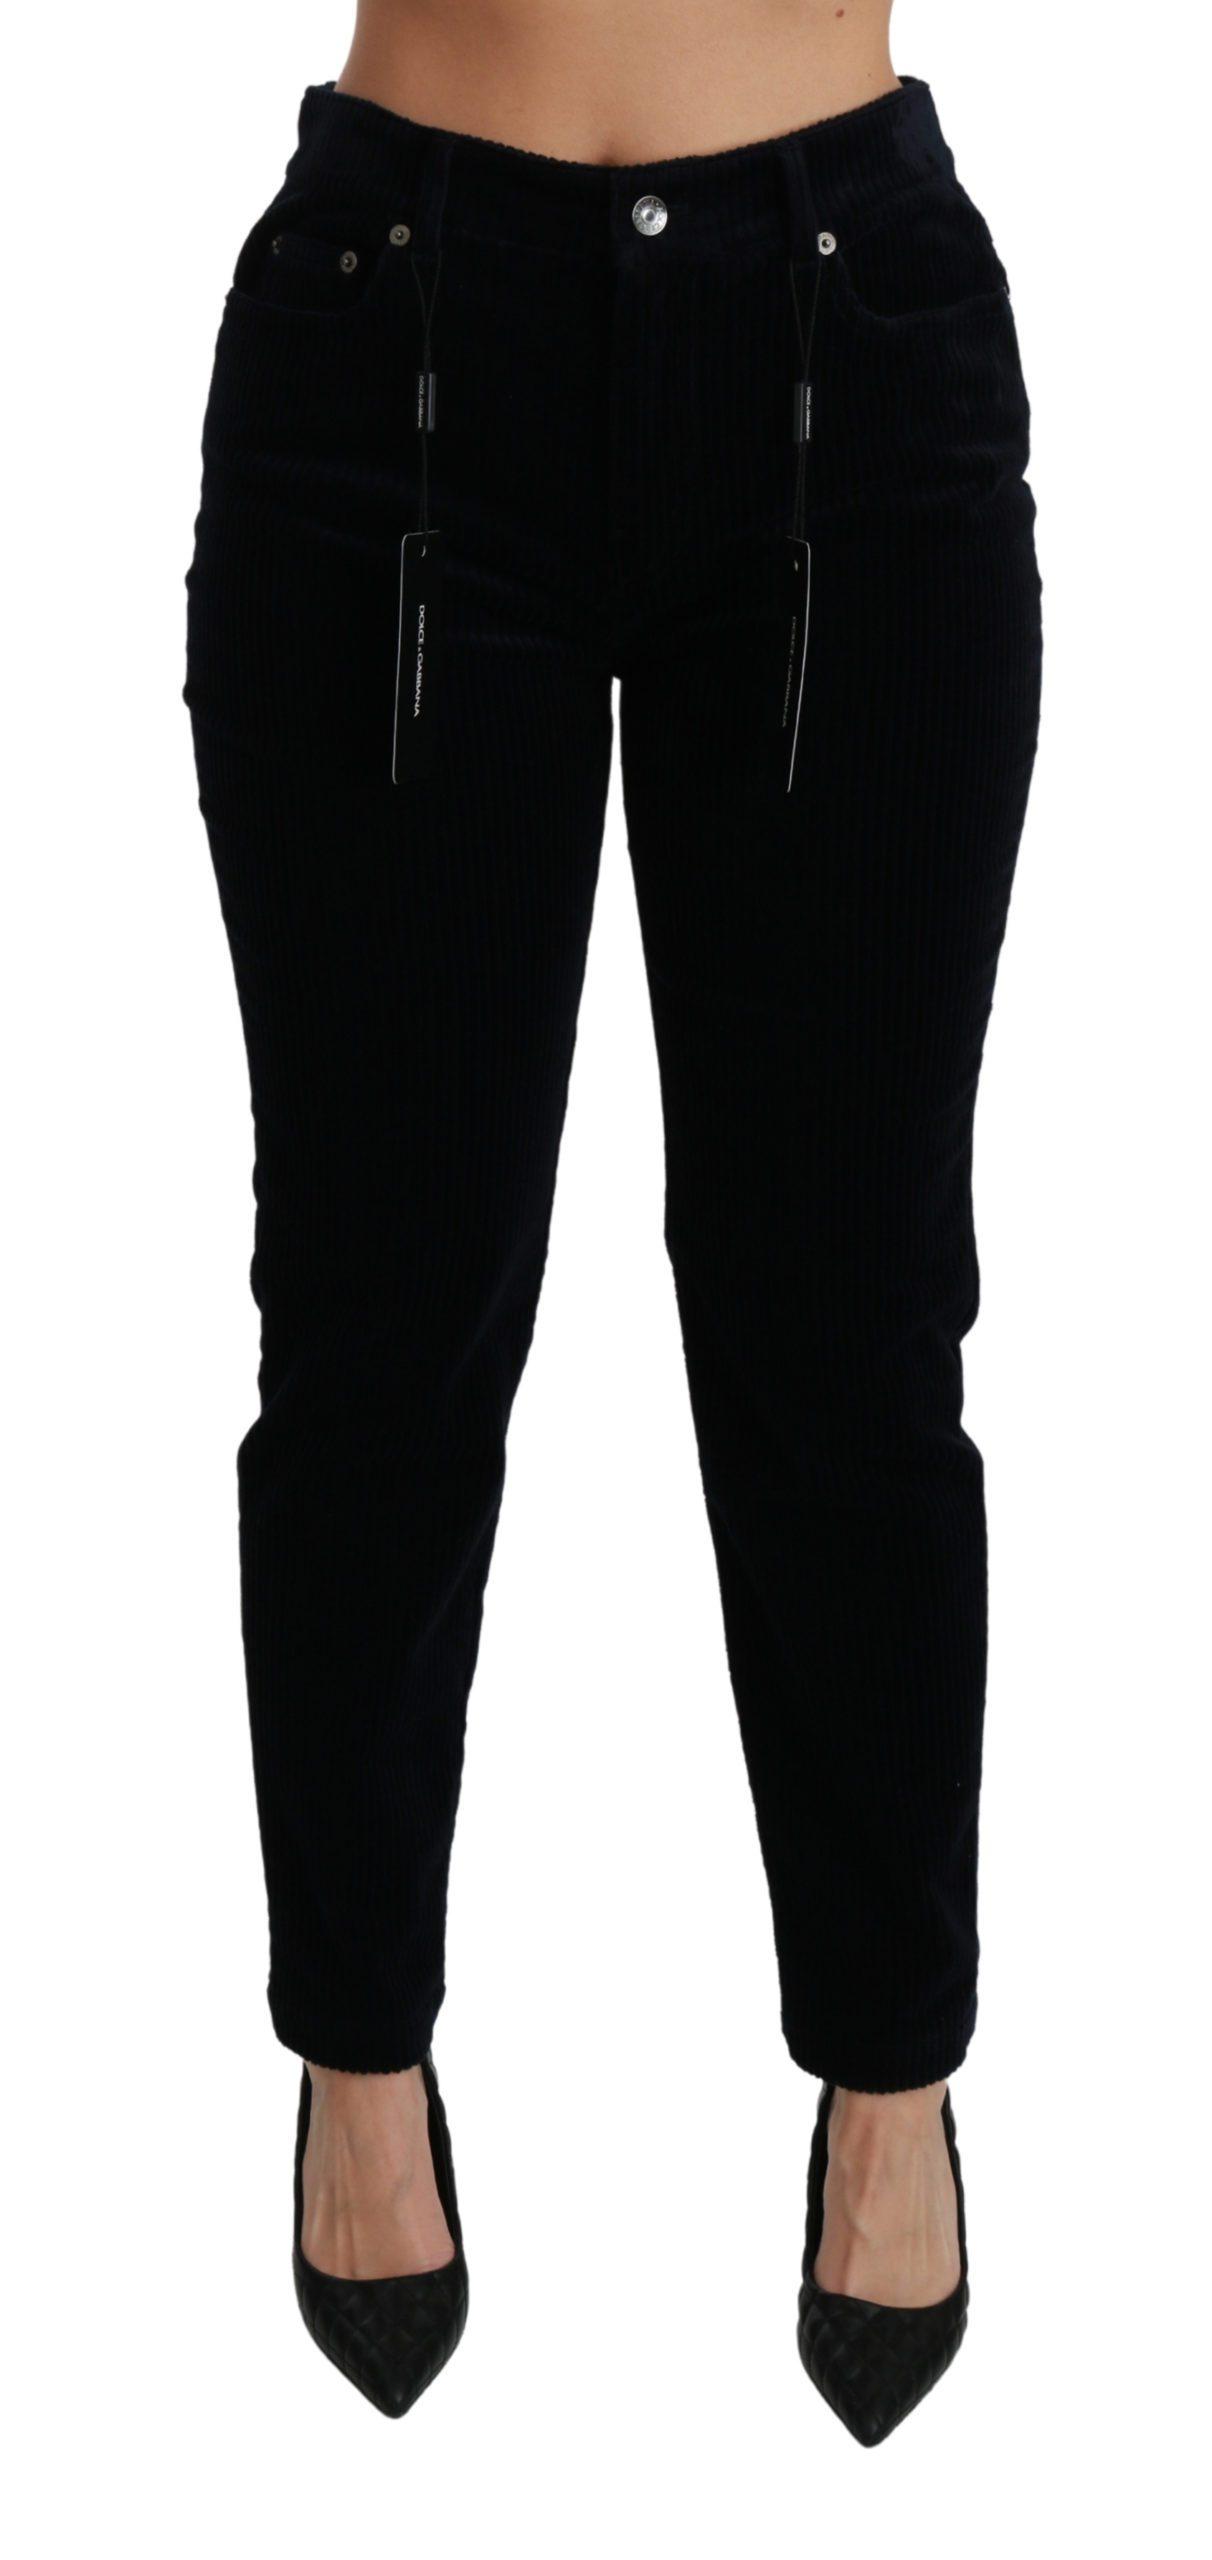 Dolce & Gabbana Women's Corduroy Mid Waist Skinny Jeans Blue PAN70925 - IT38 XS